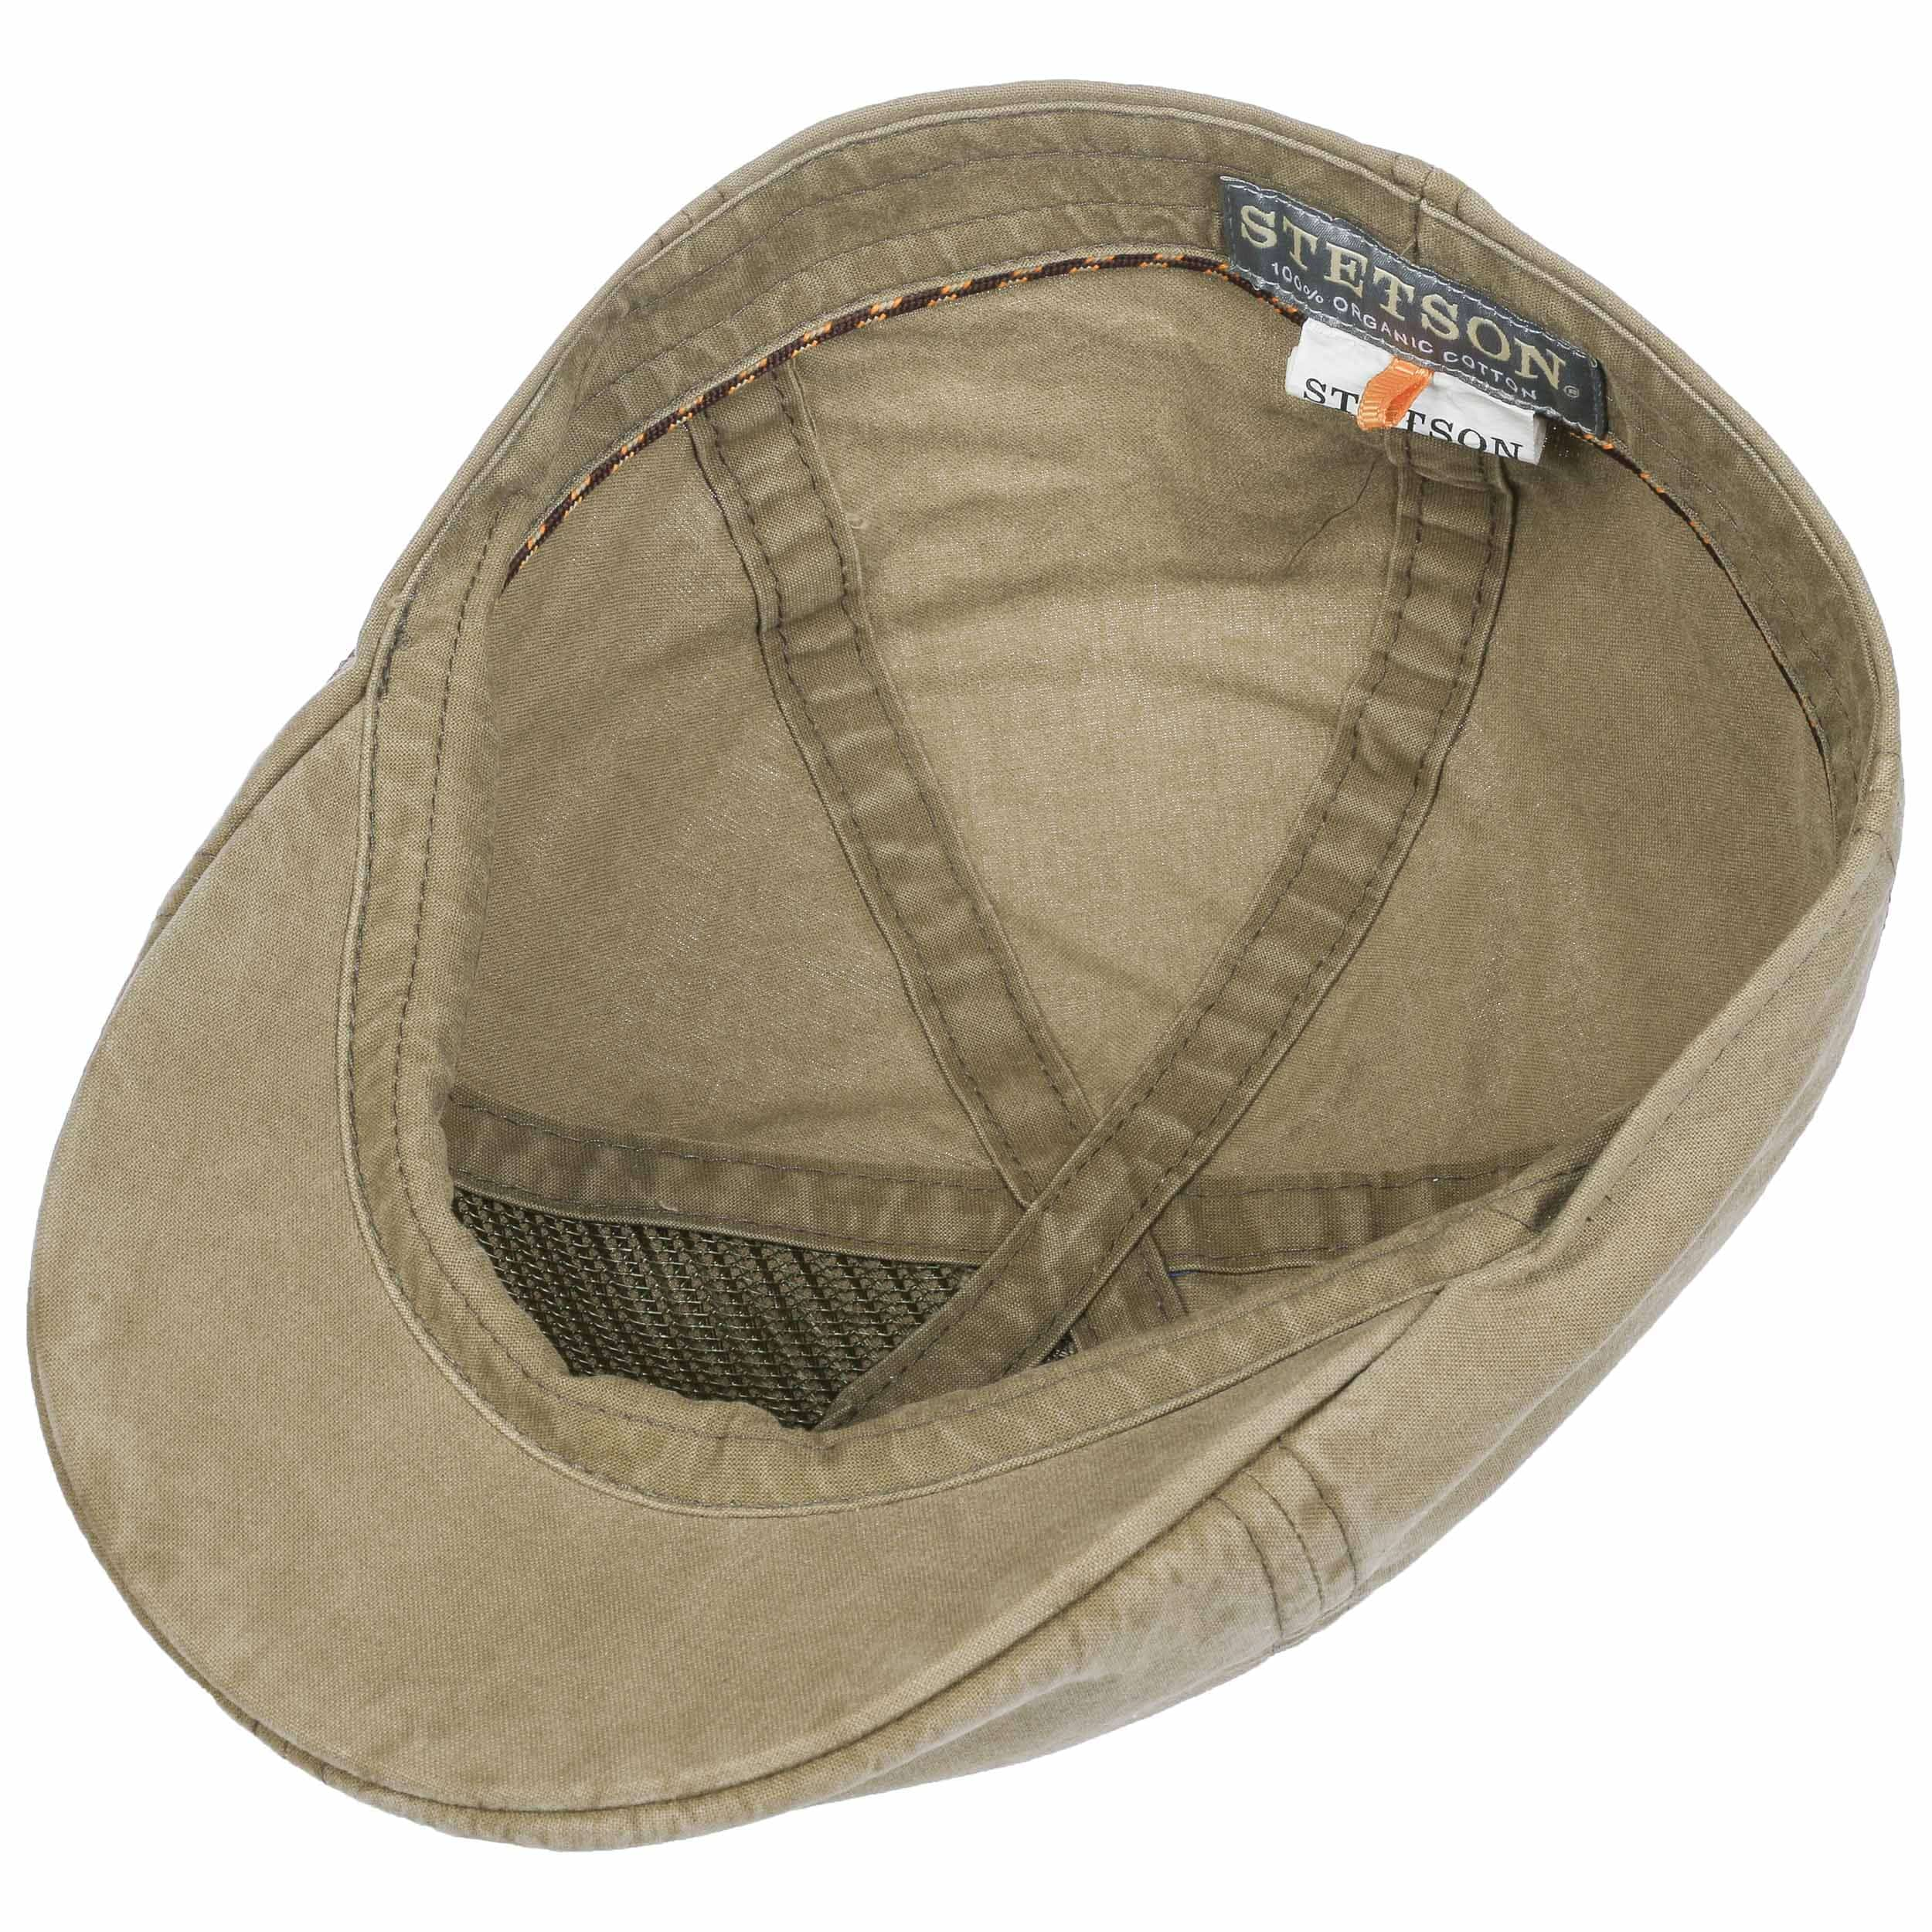 7619c49ac0f ... Texas Organic Cotton Flat Cap by Stetson - dark beige 2 ...